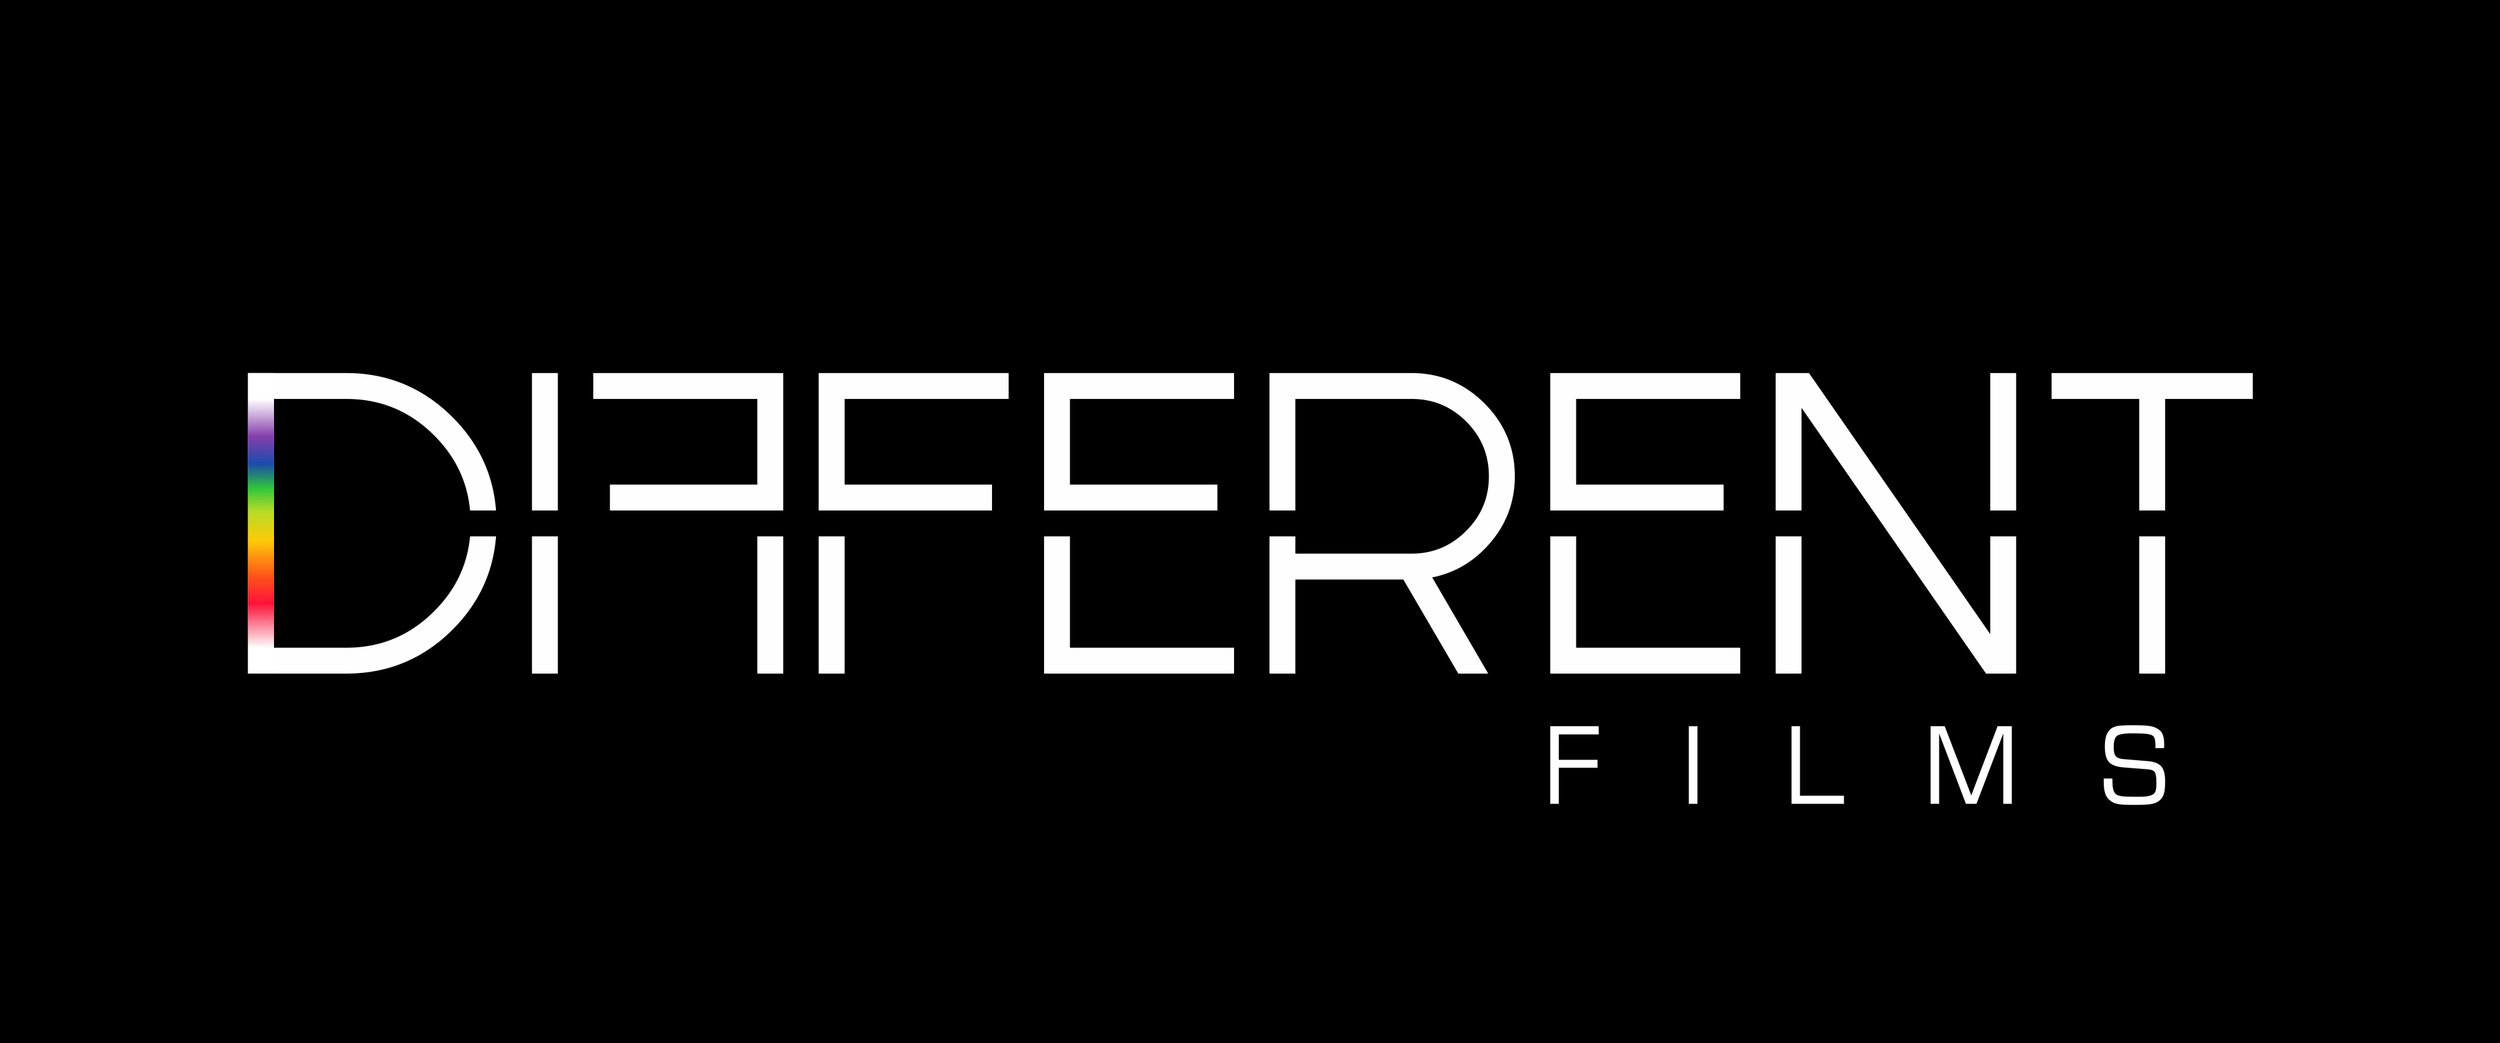 Different Films